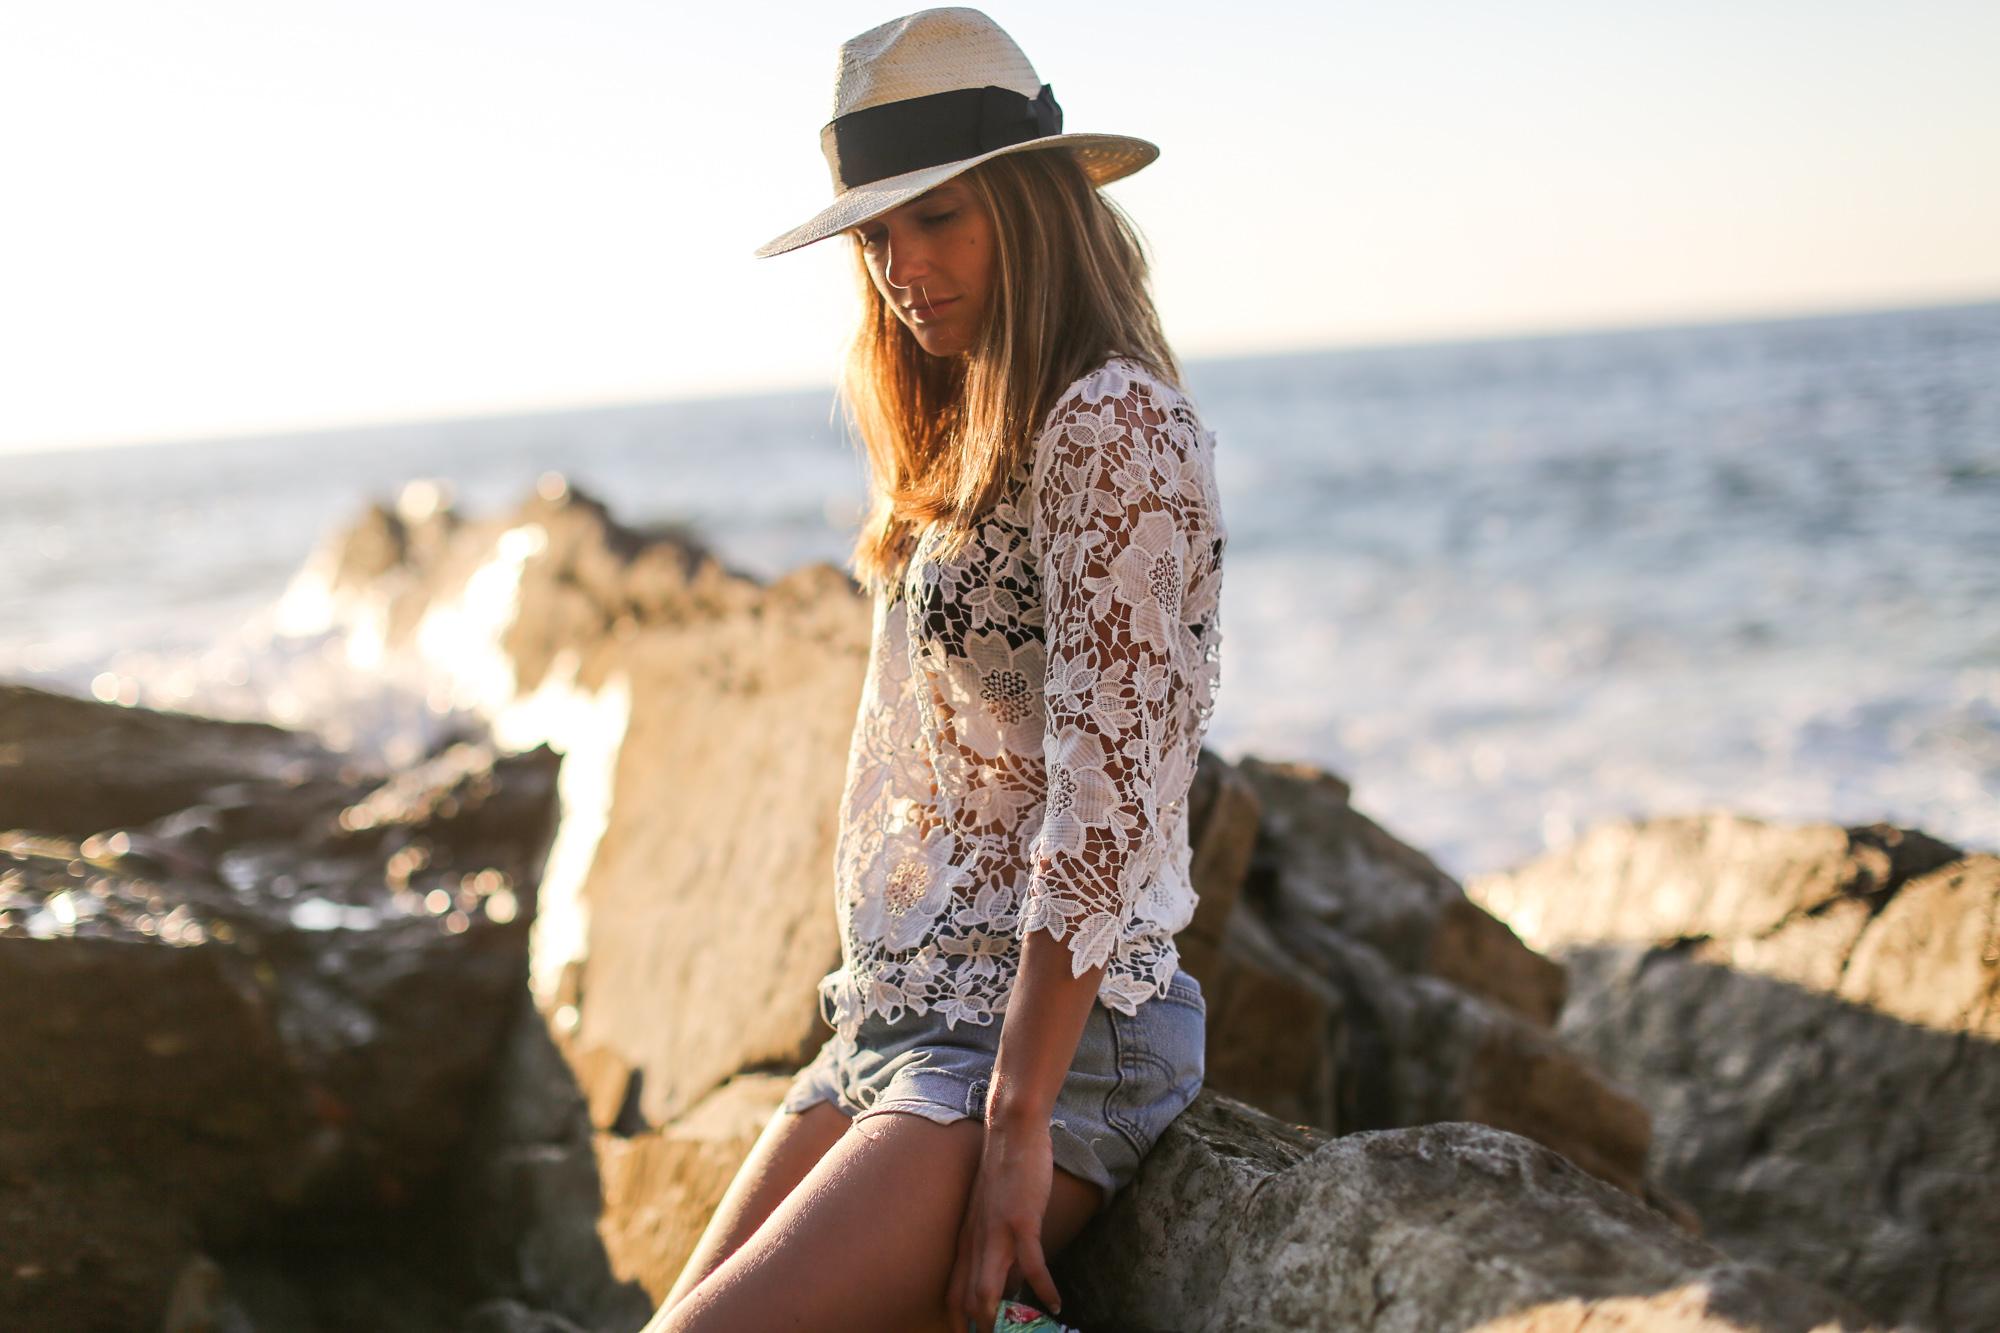 Clochet-streetstyle-vintage-levis501-crochet-top-fedora-straw-hat-5